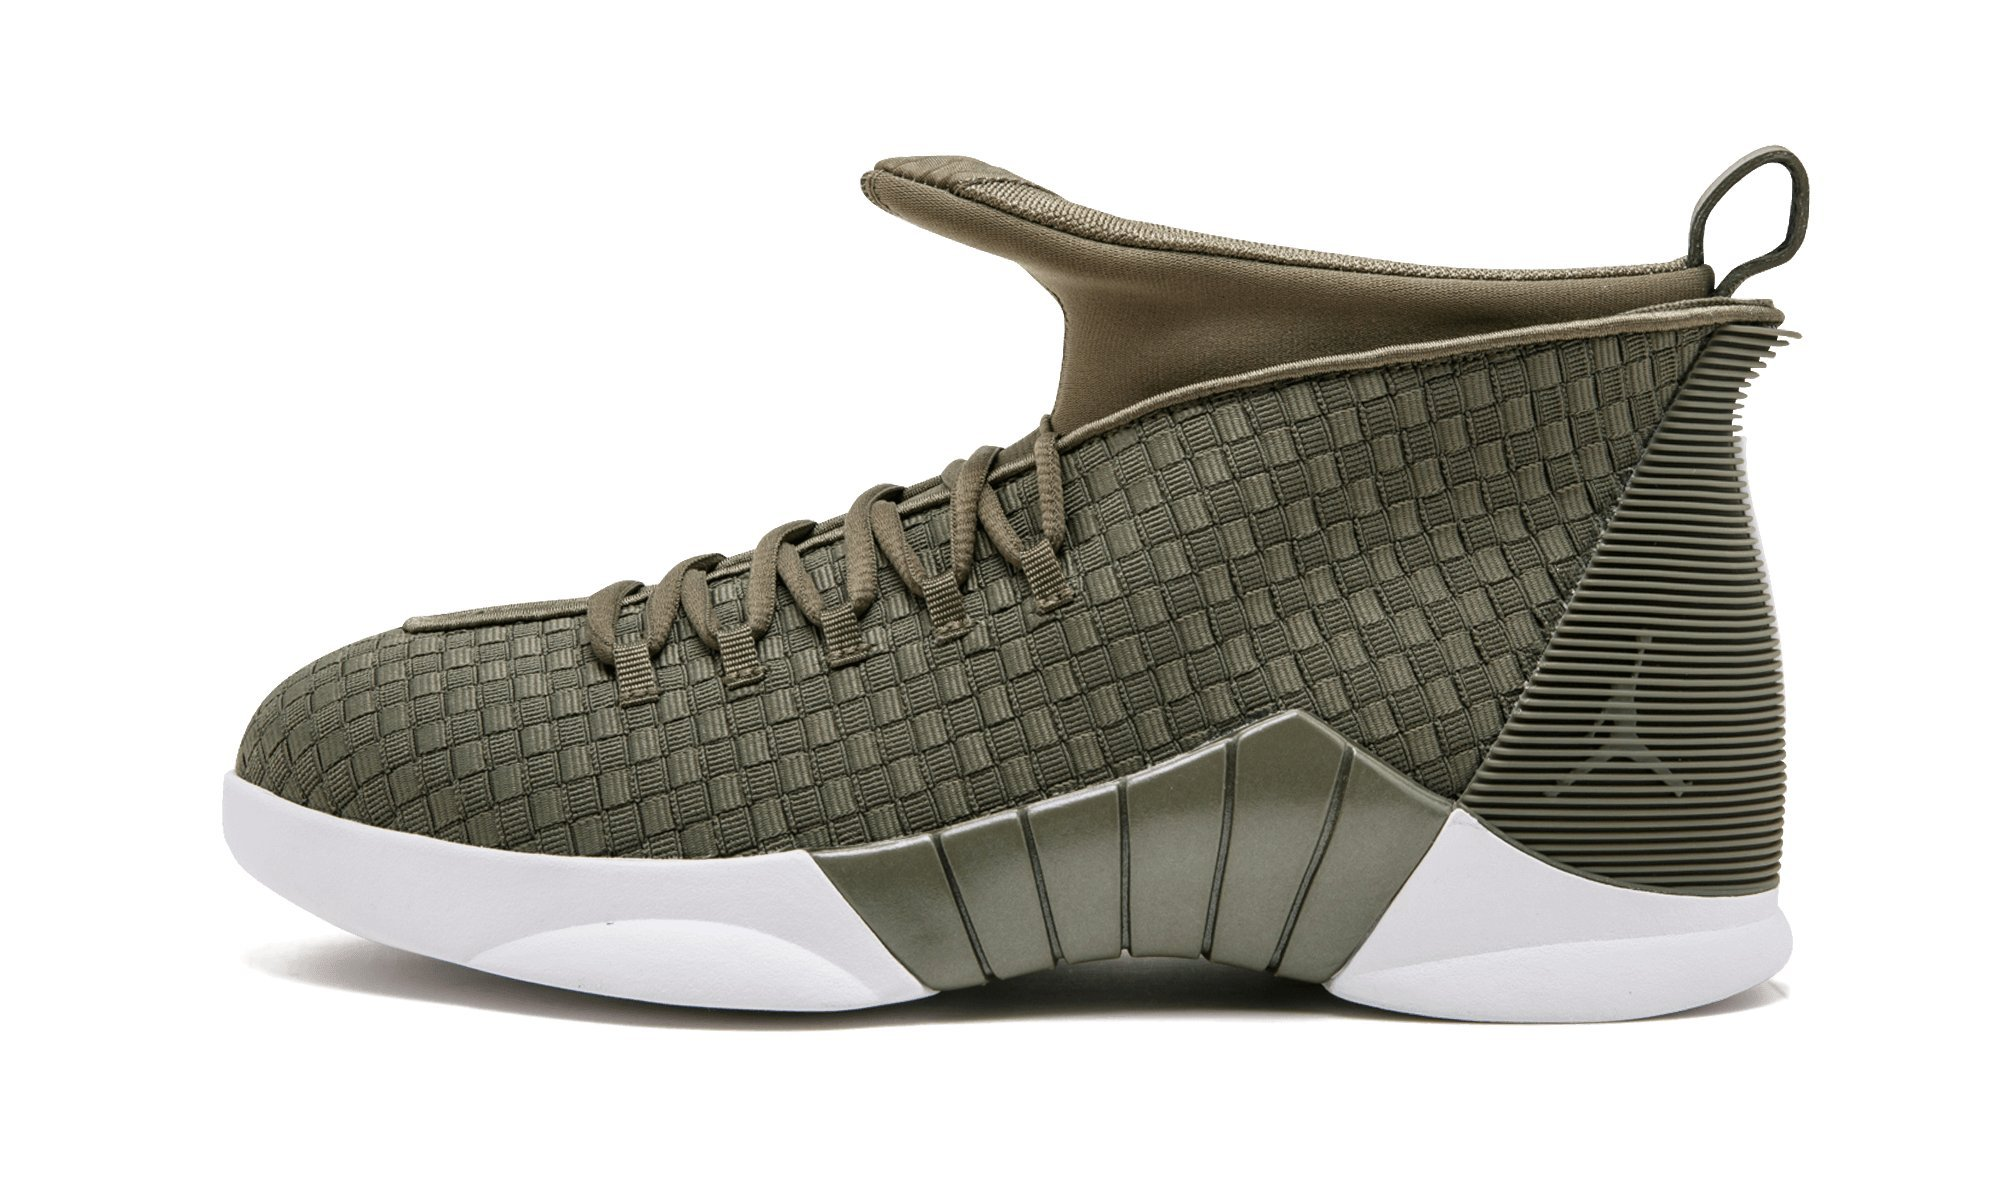 90fb97e8a3a Jordan 15 Size 10.5 Top Deals & Lowest Price | SuperOffers.com